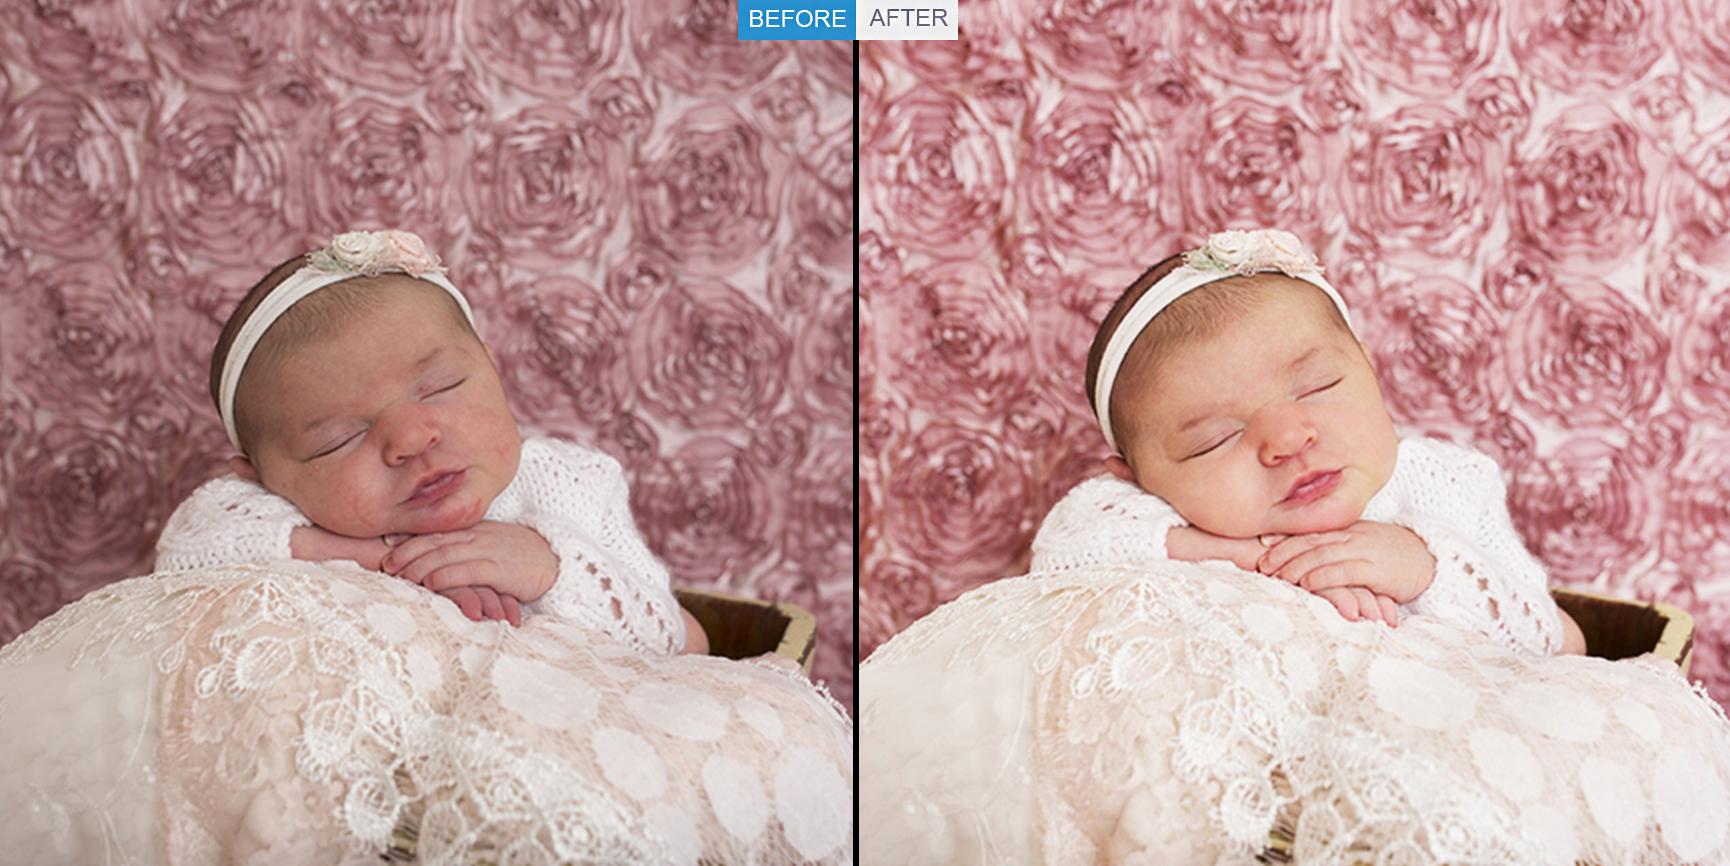 '' Newborn Photo Editing''